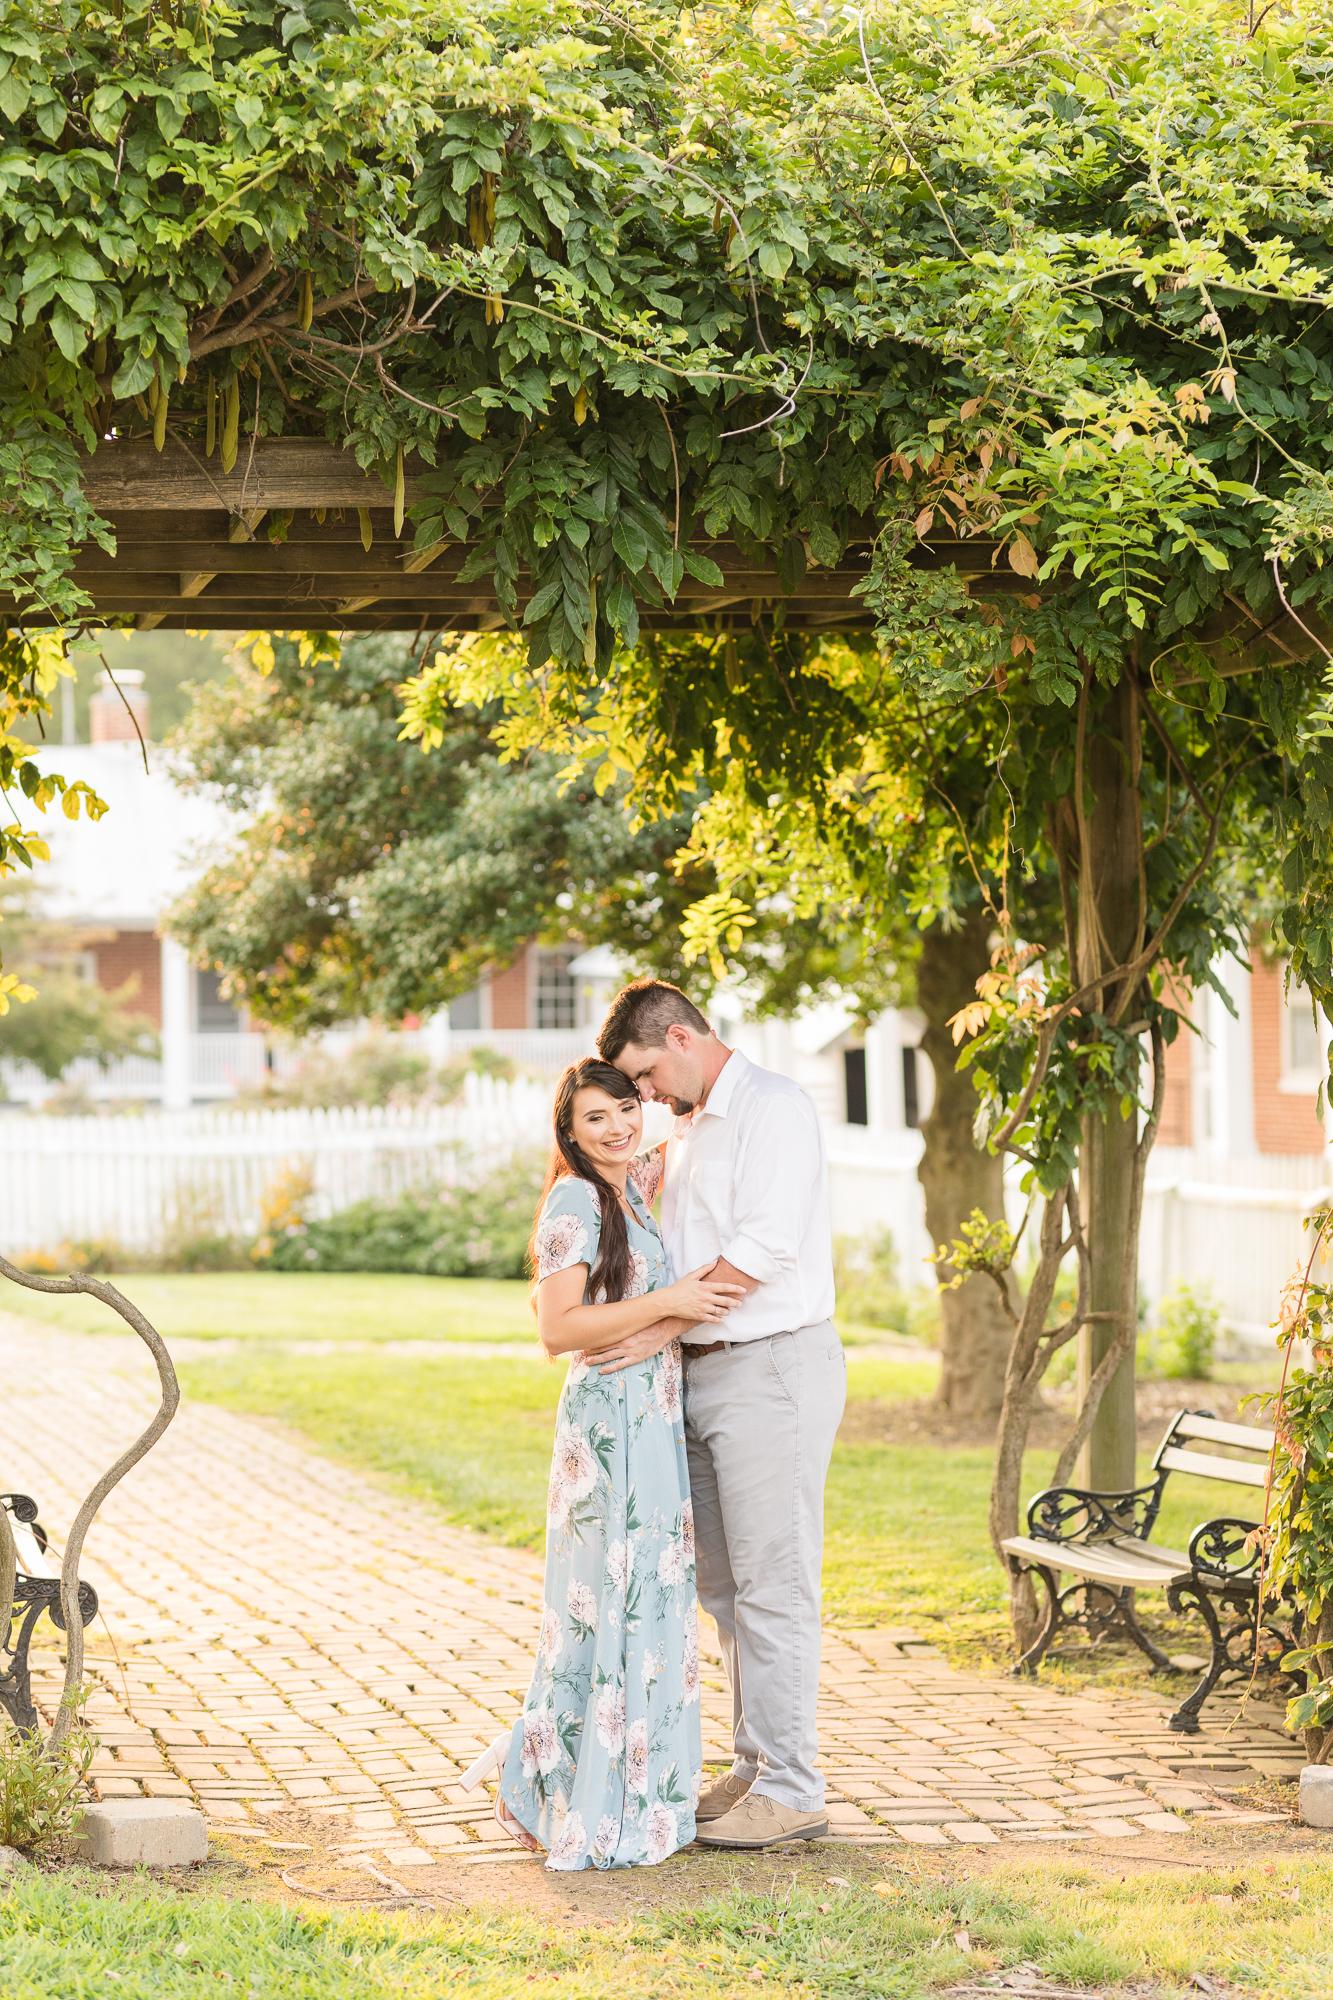 Carroll-County-Farm-Museum-Engagement-201.jpg